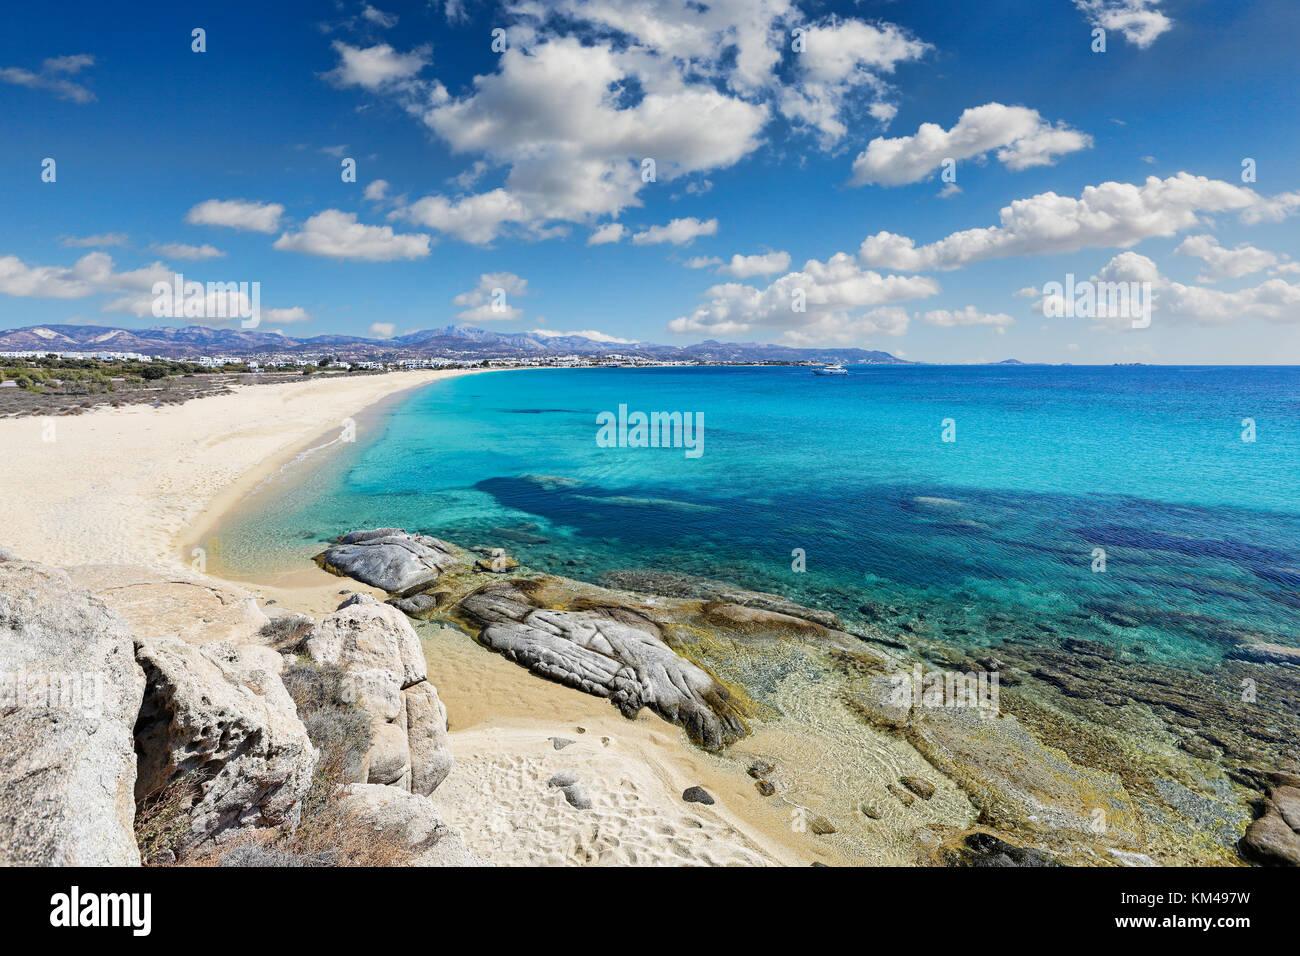 Agios Prokopios beach in Naxos Island, Grecia Foto Stock